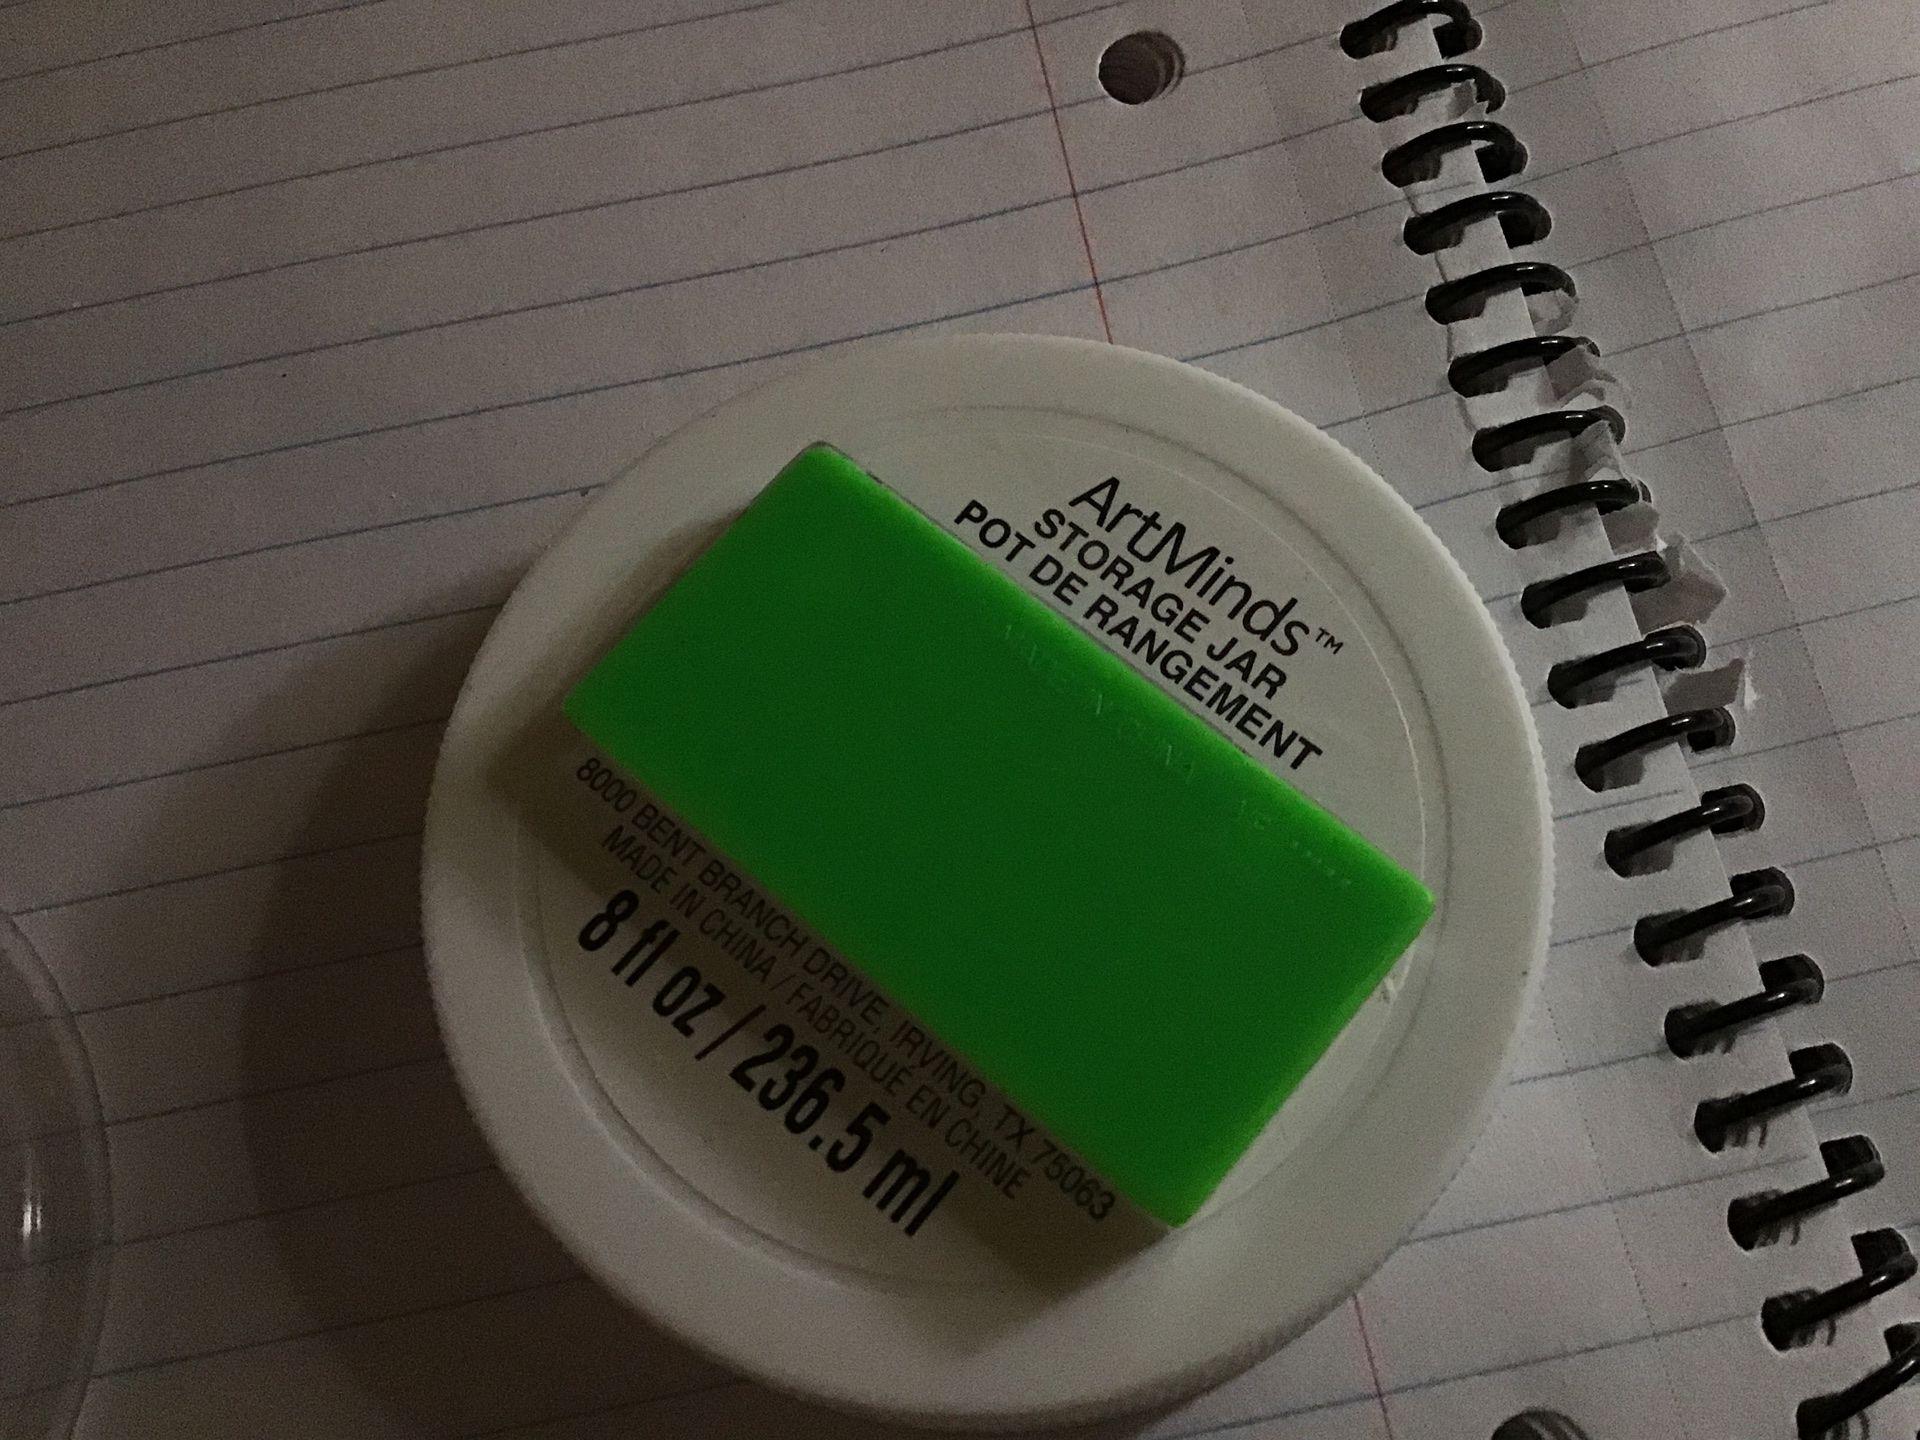 8oz container